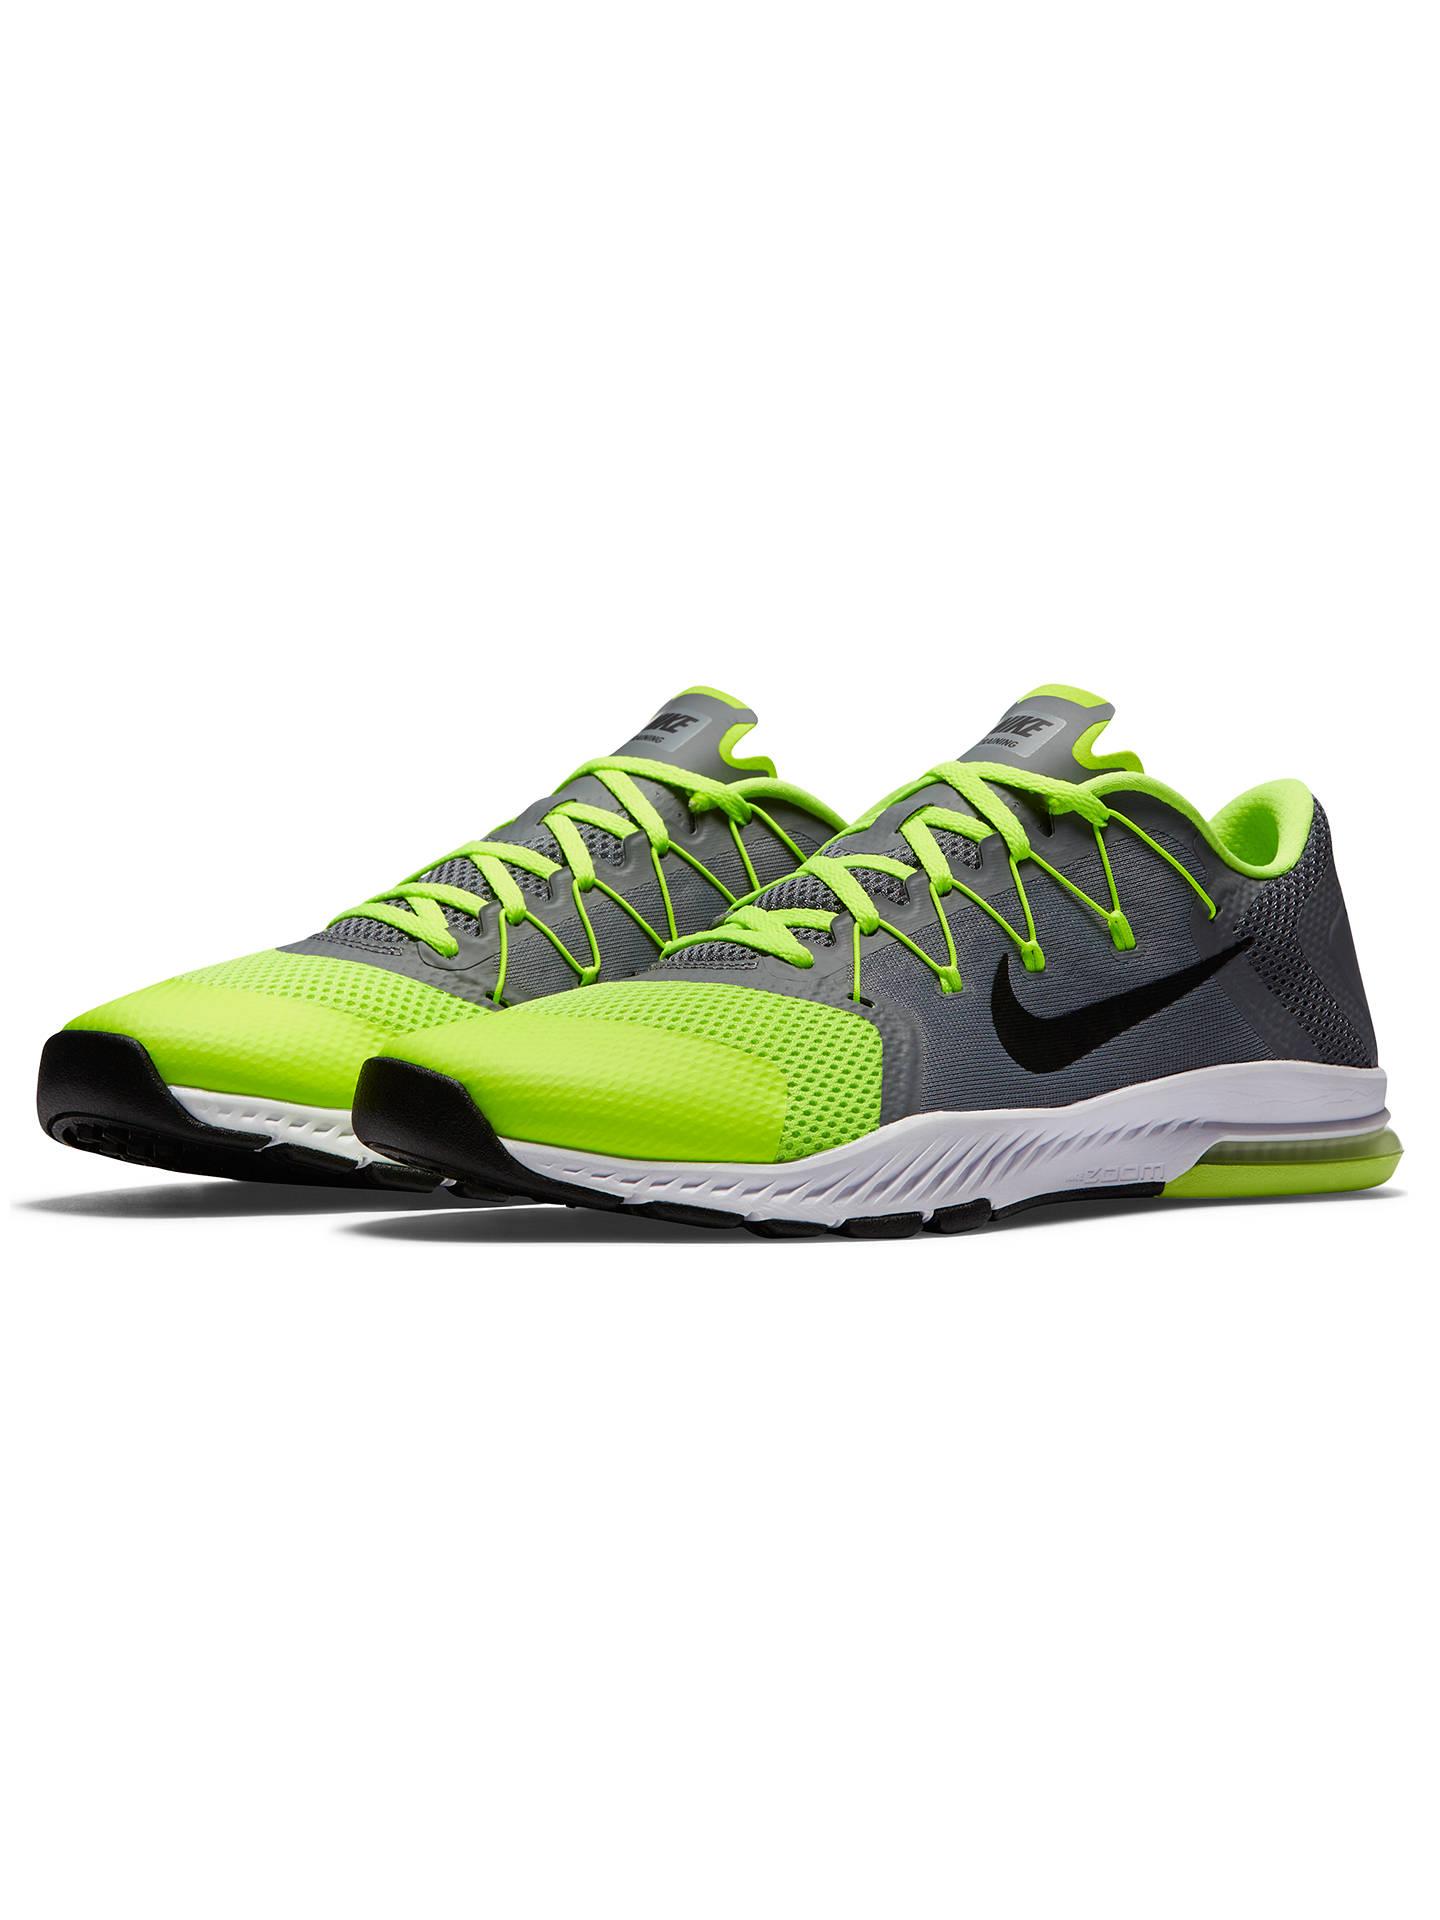 497f99bd1bd68 ... Buy Nike Zoom Train Complete Men s Cross Trainers